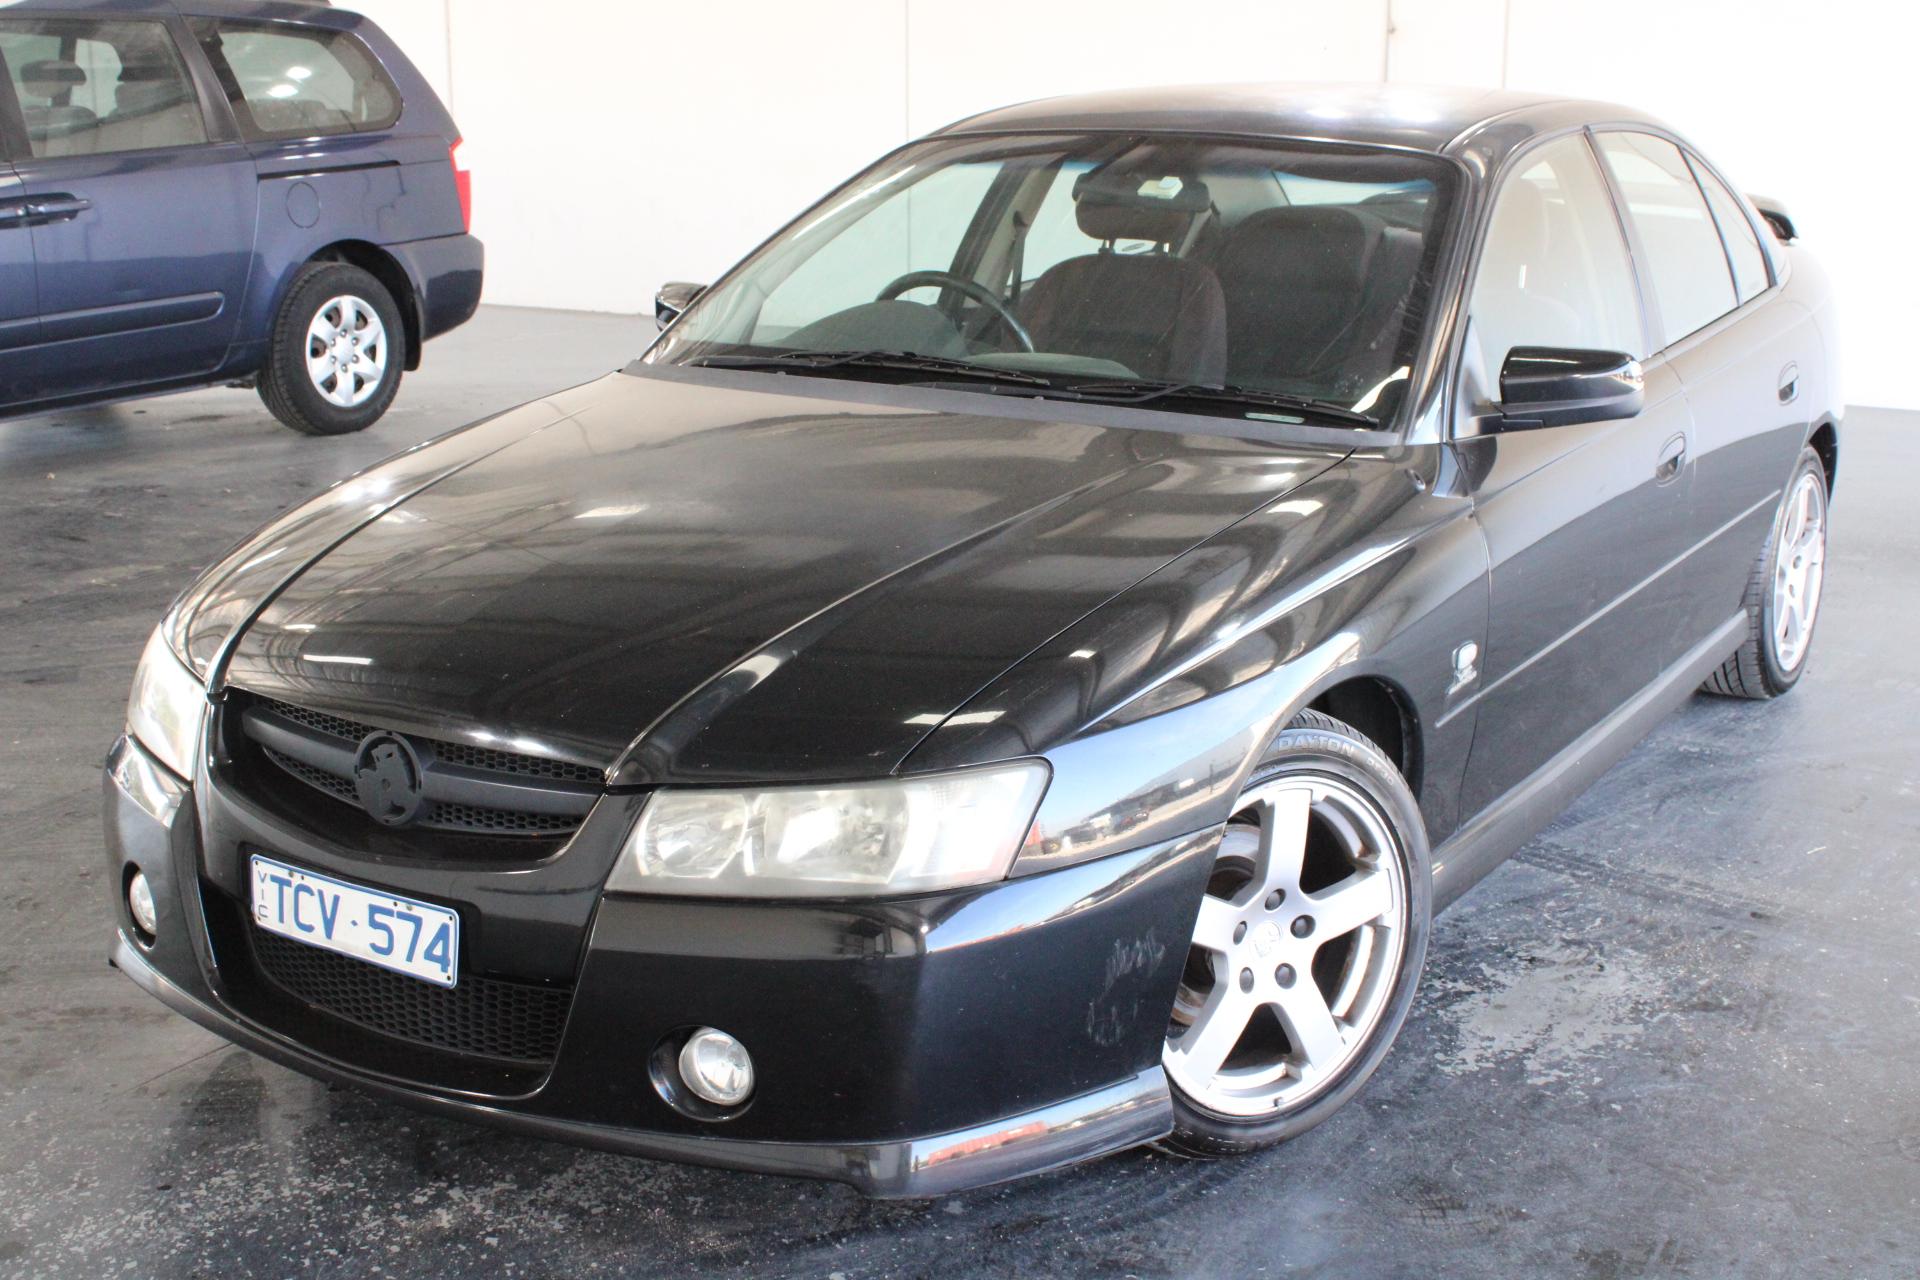 2004 Holden Commodore SV6 VZ Manual Sedan